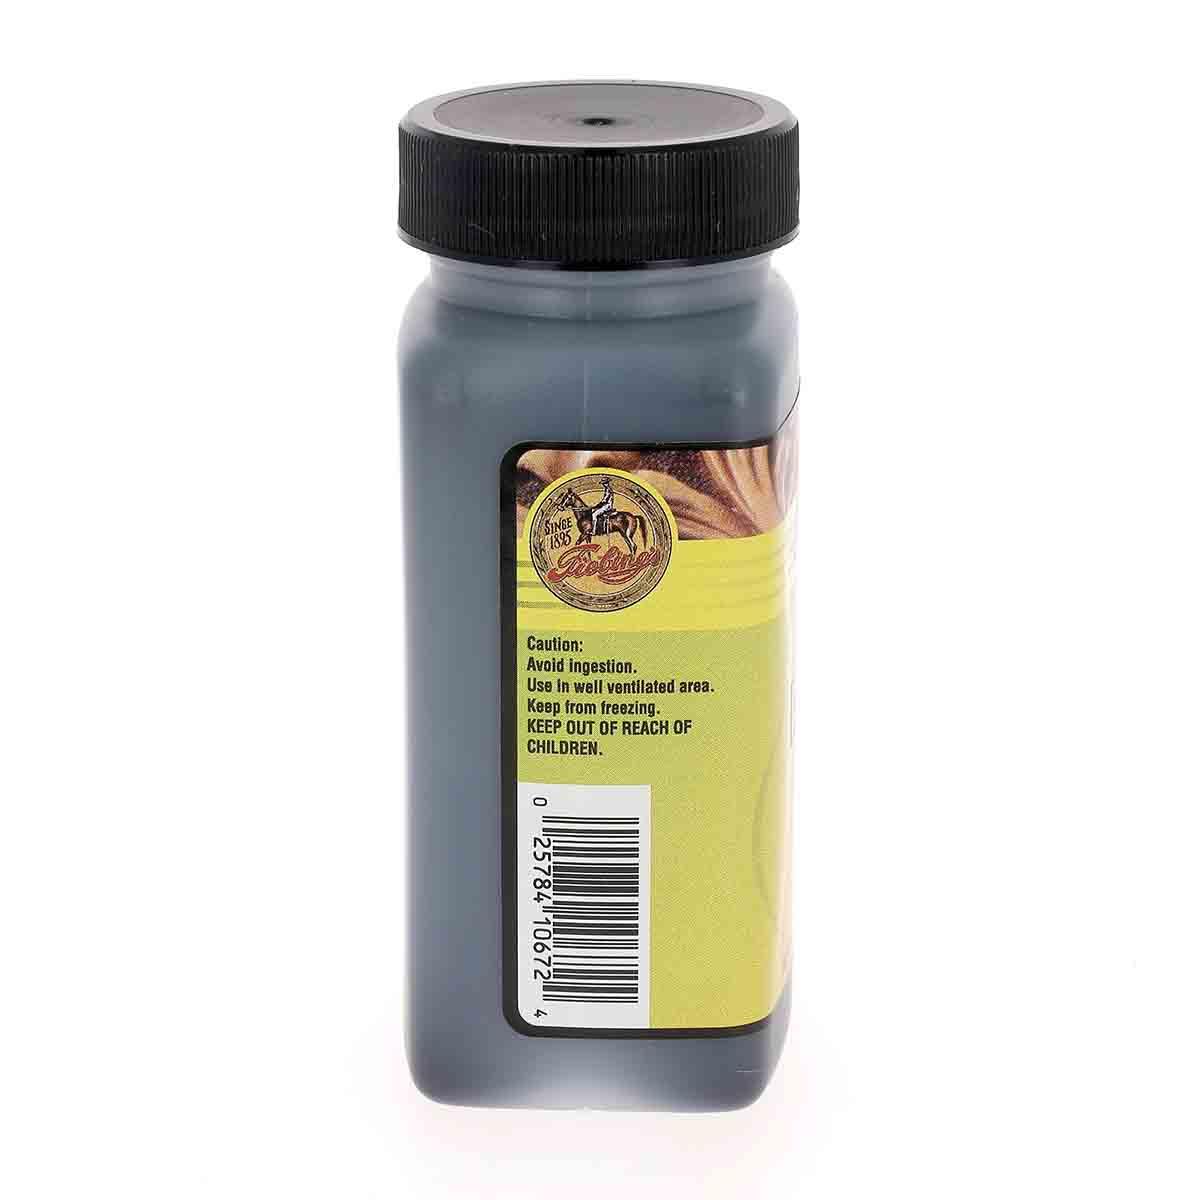 Teinture pour repoussage FIEBINGS  Hi-Liter - Bidon de 118 ml